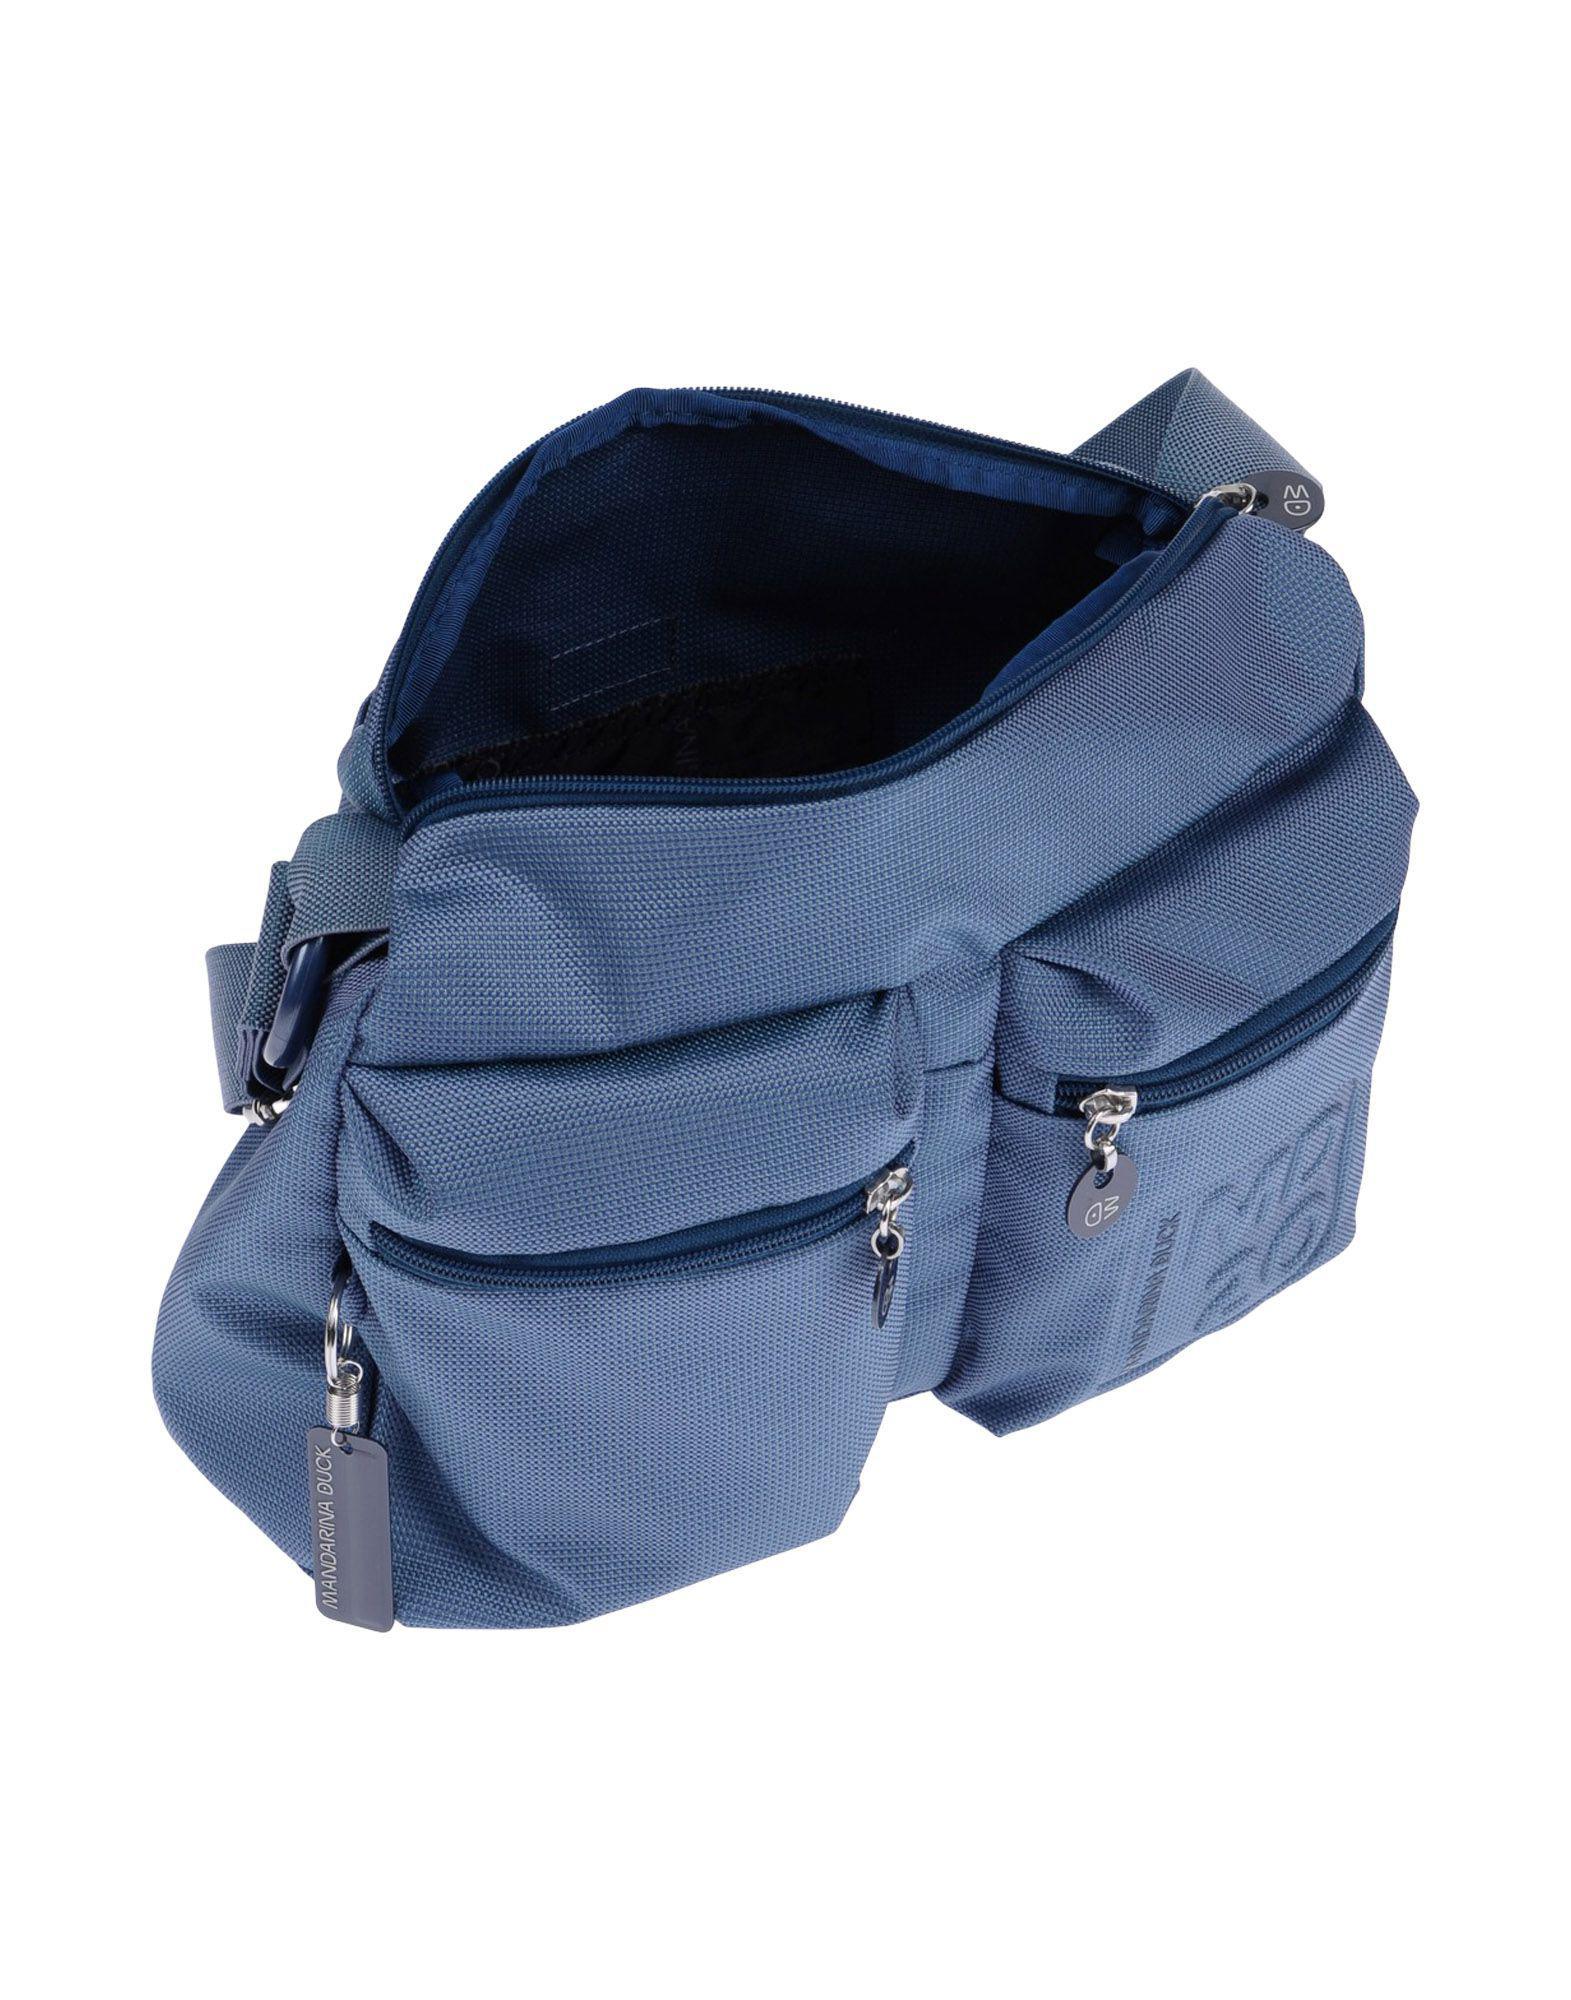 c01ef4f3a Lyst - Bolso con bandolera Mandarina Duck de color Azul